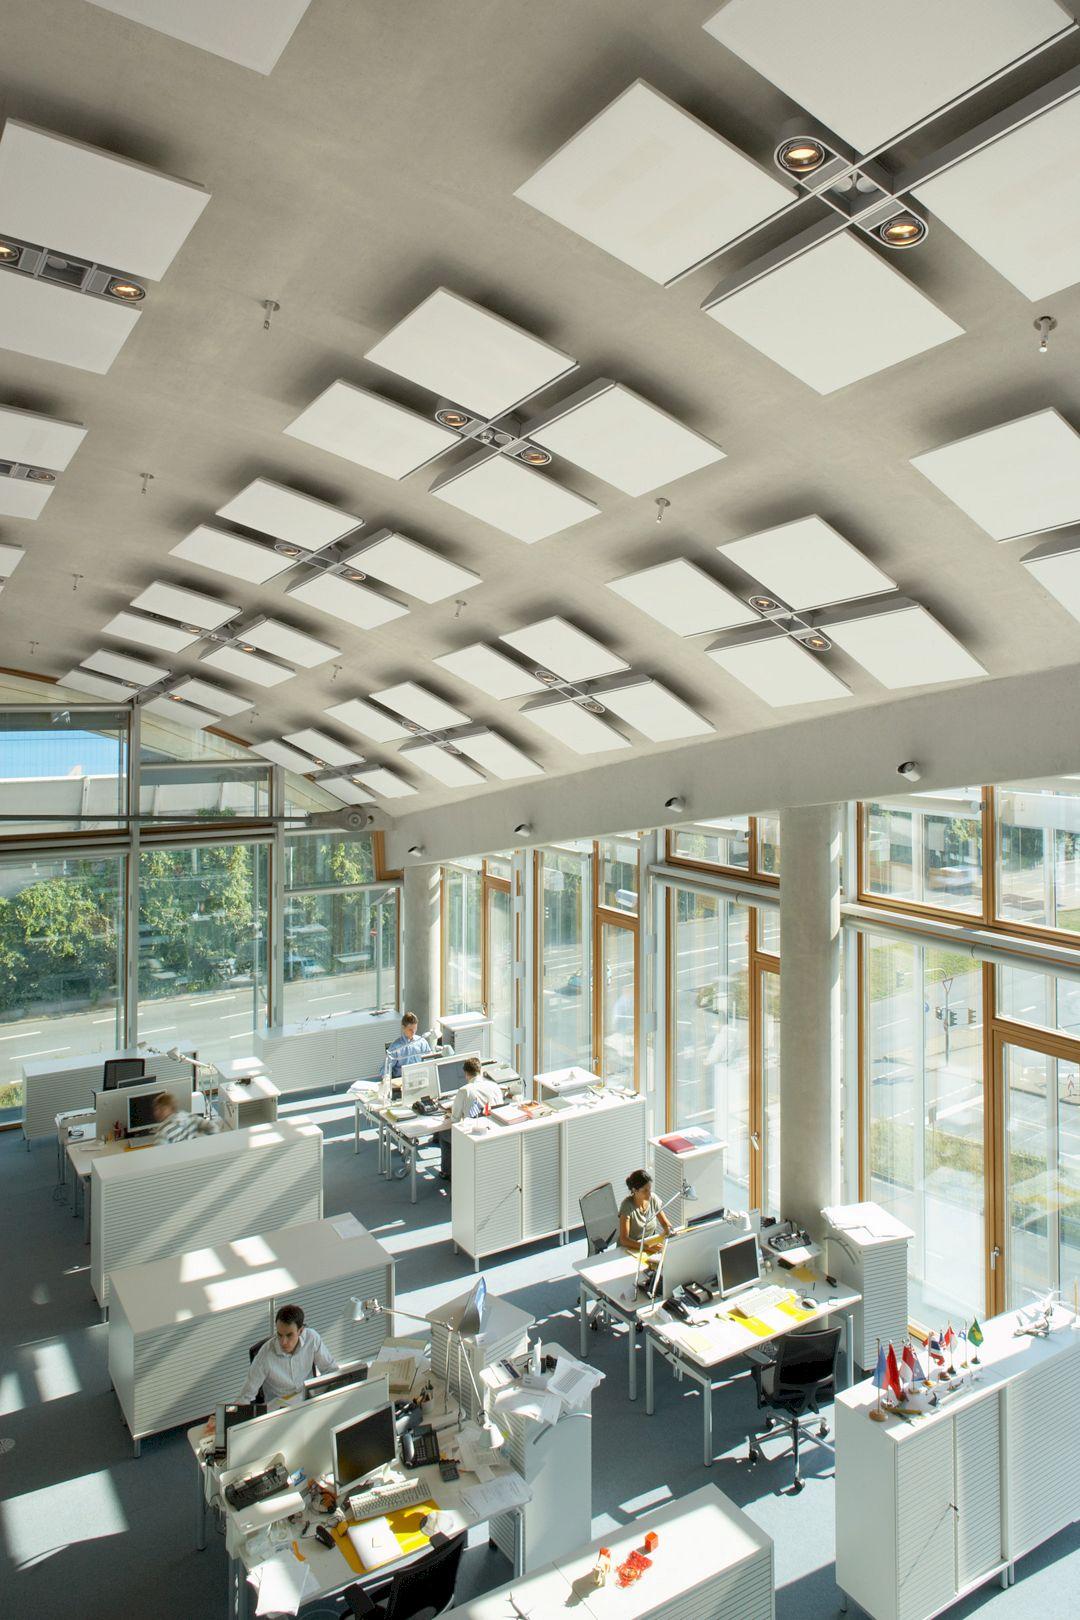 Lufthansa Aviation Center Frankfurt By Ingenhoven Architects 7